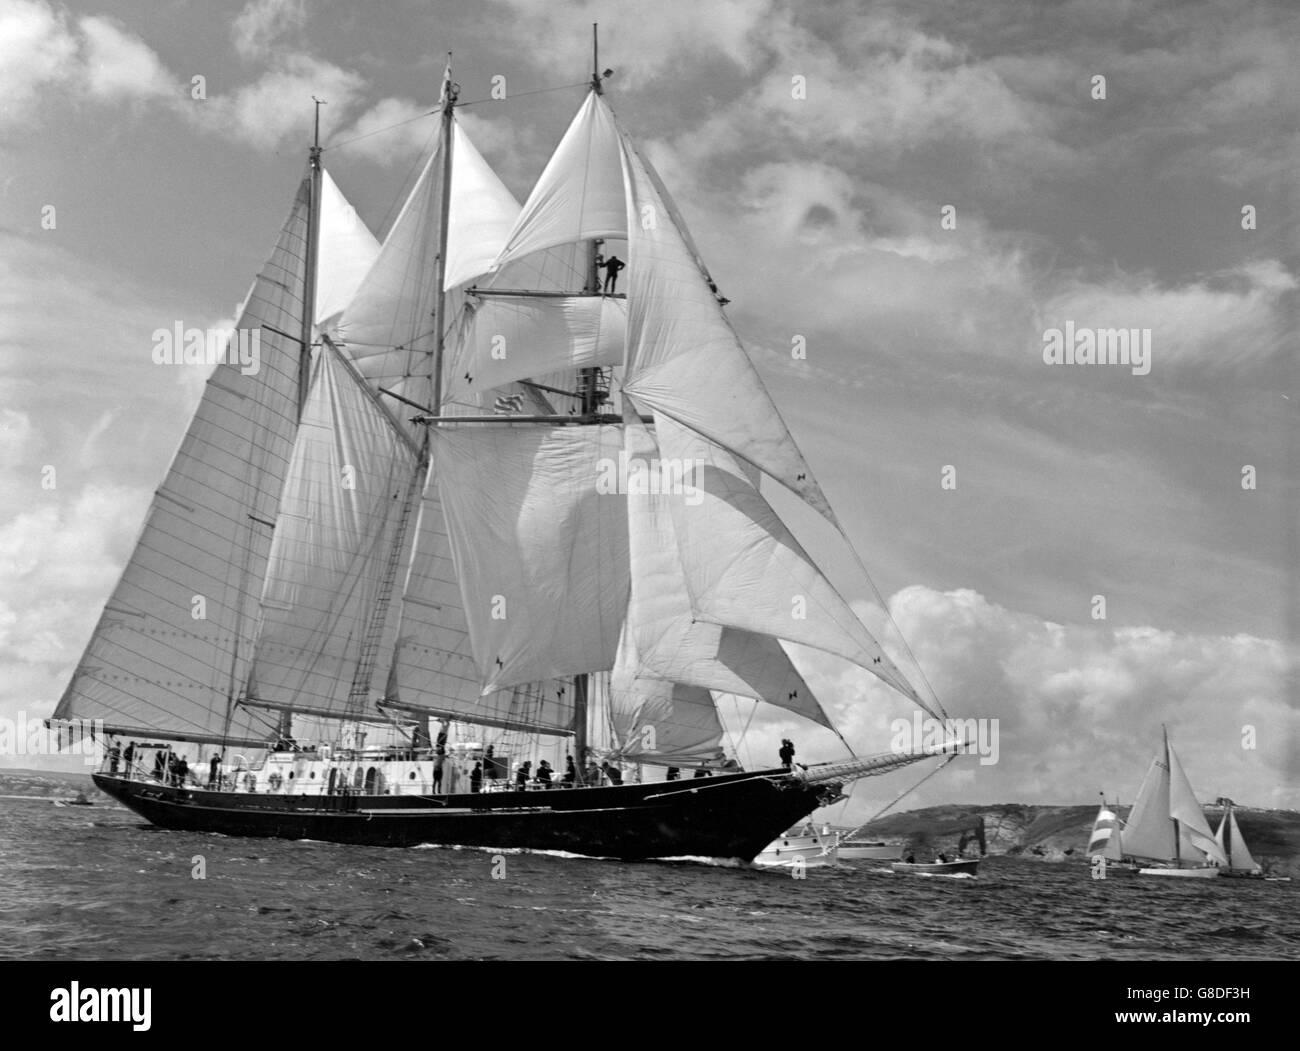 Sailing - Tall Ships Race - Sir Winston Churchill Schooner - Falmouth, Cornwall - Stock Image